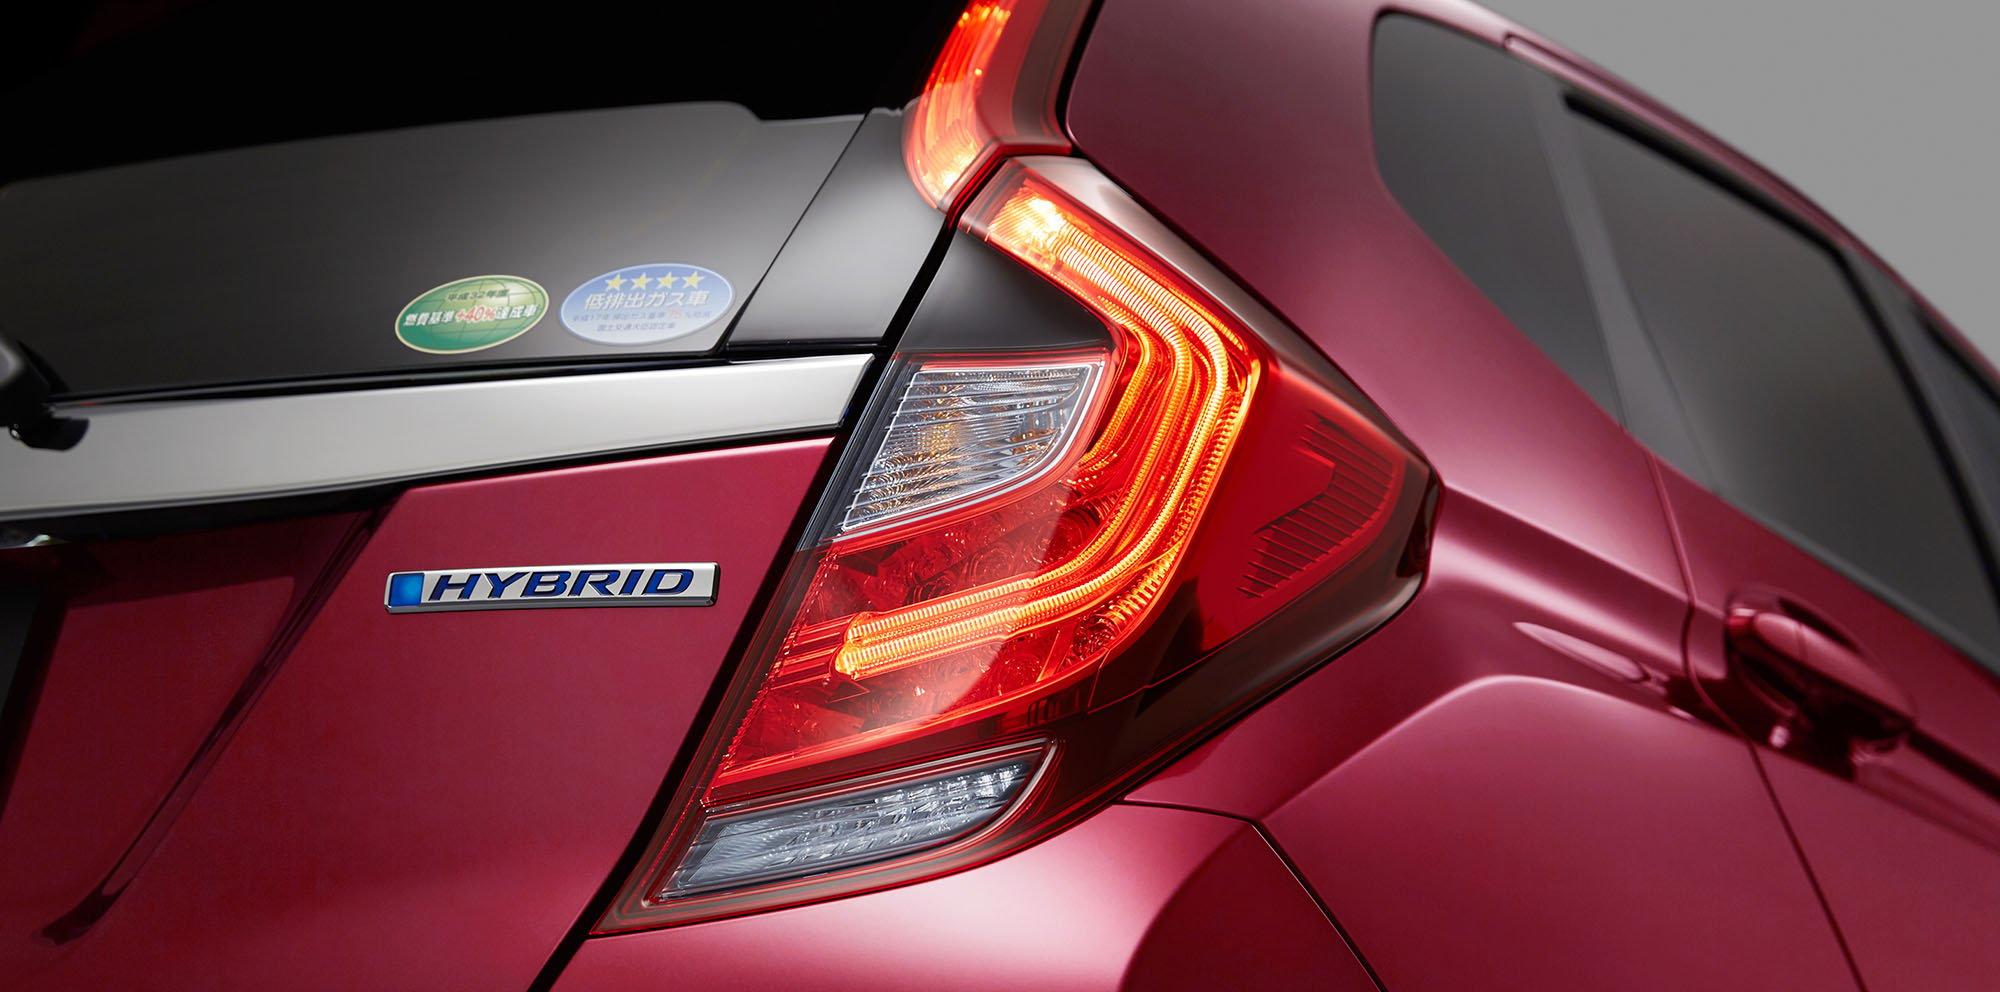 2018 Honda Jazz facelift unveiled in Japan - Photos (1 of 4)